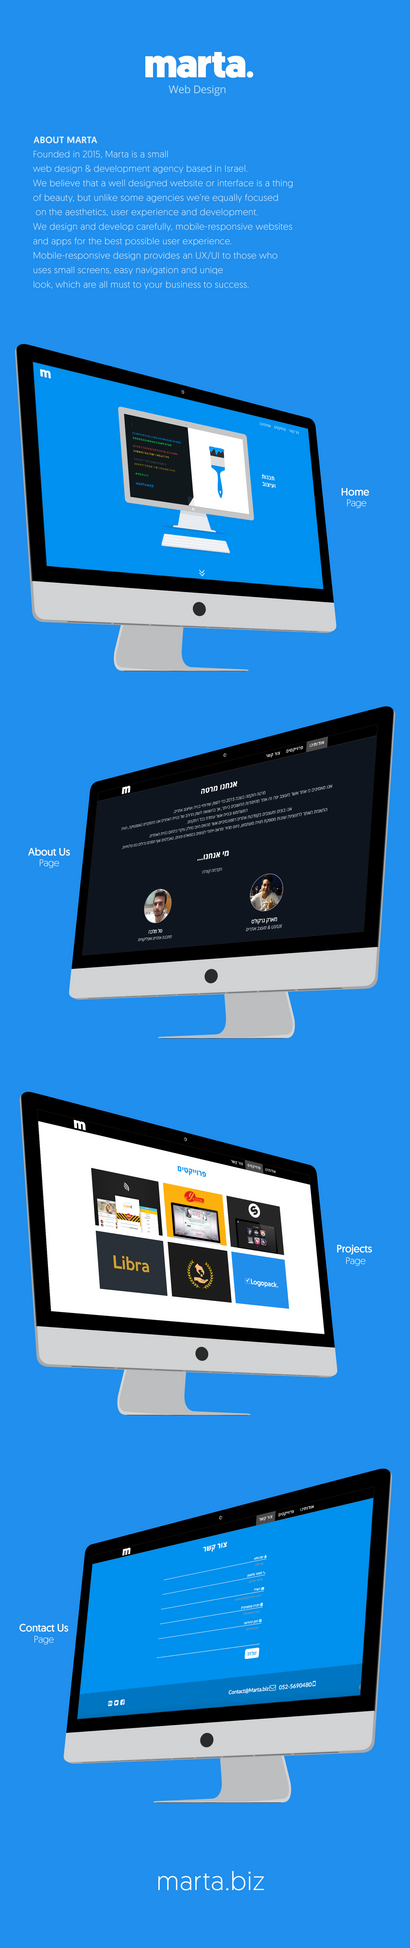 Marta - Web Design by MarkARTGD